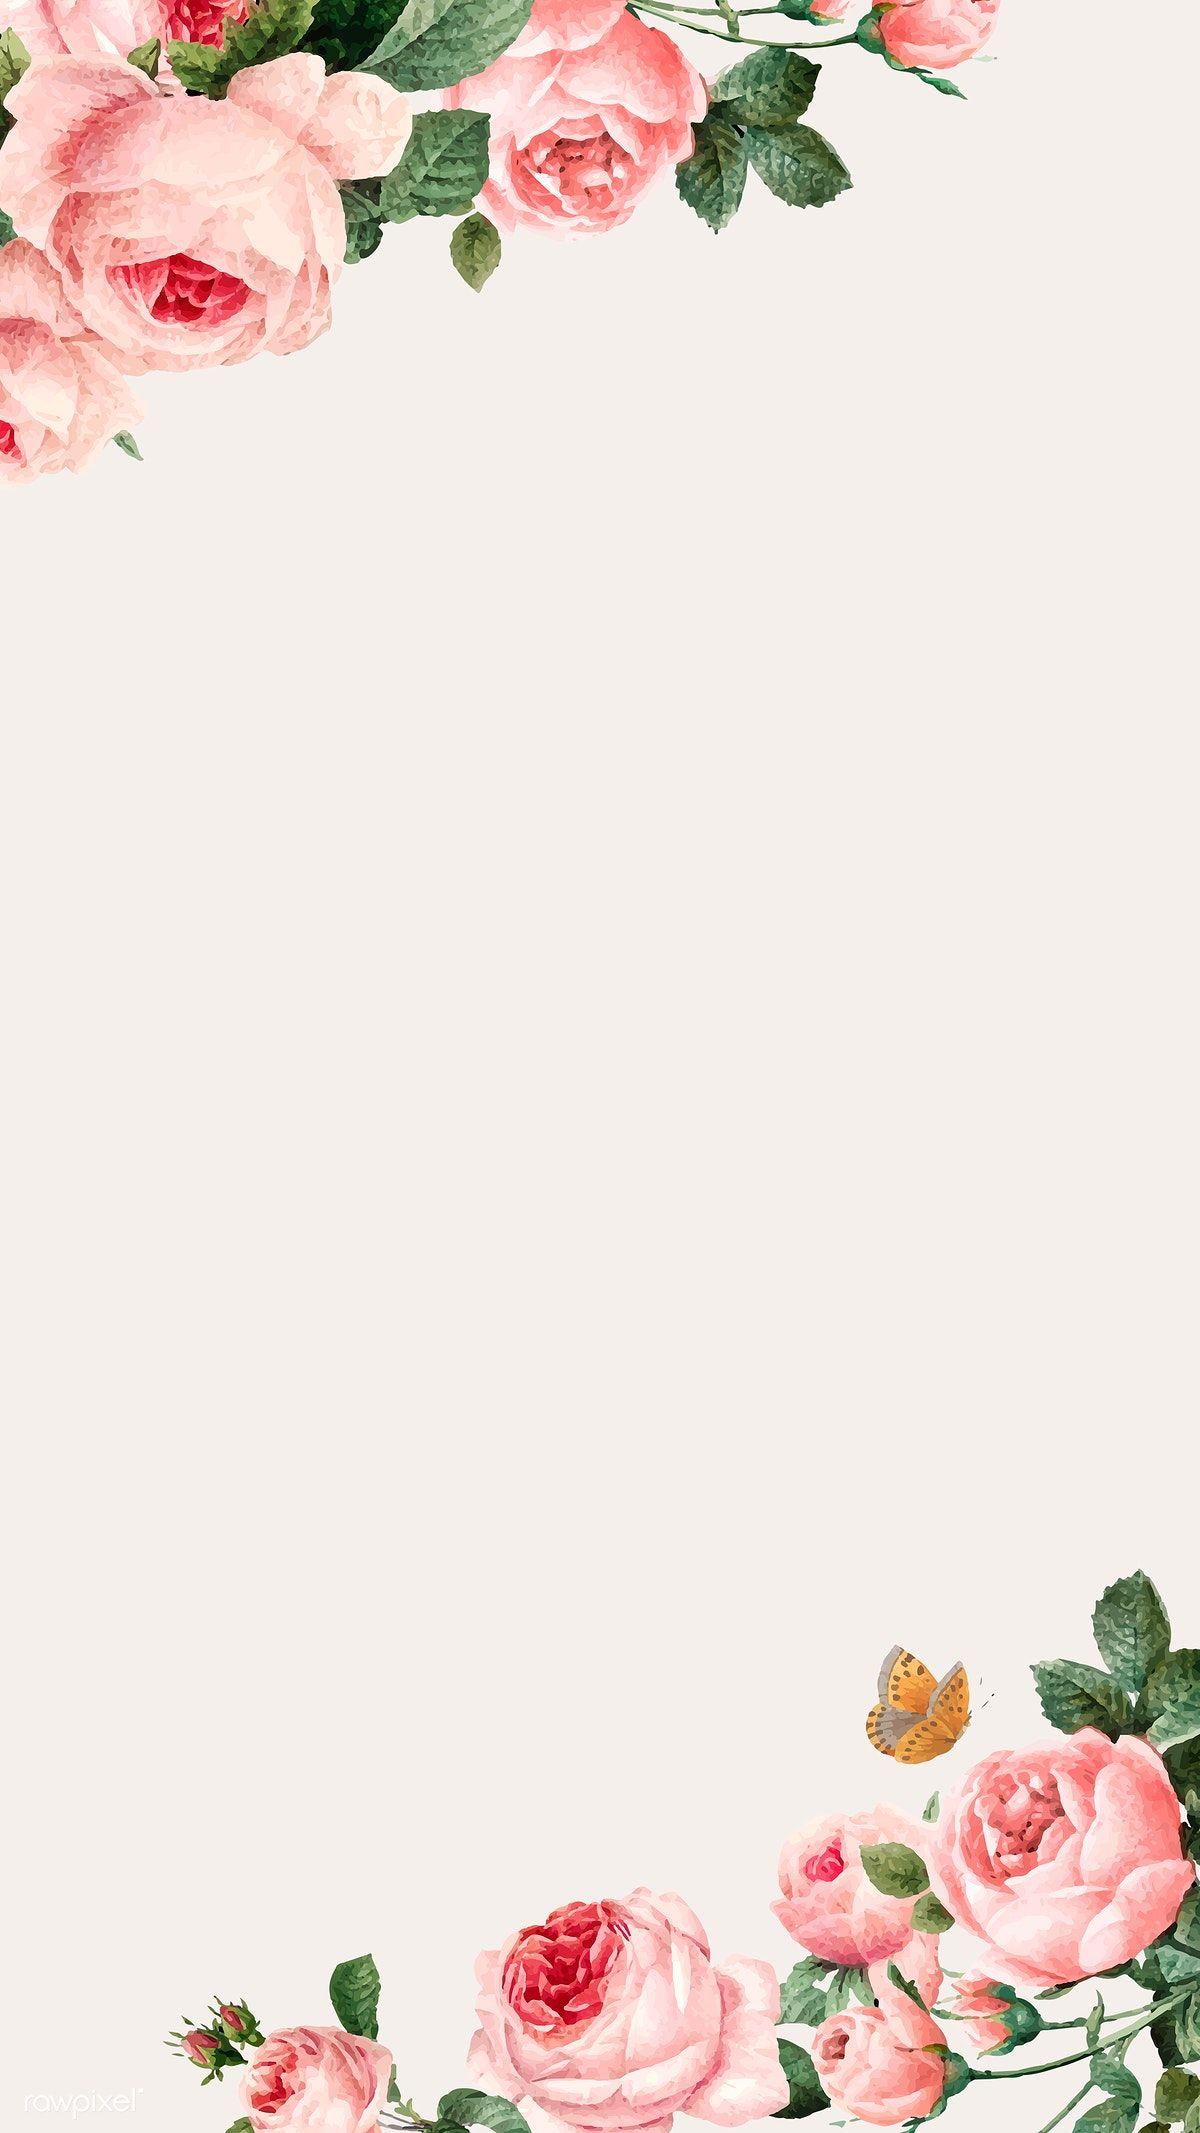 Beautifully Painted Wreath, Flower Vector, Flower, Flower